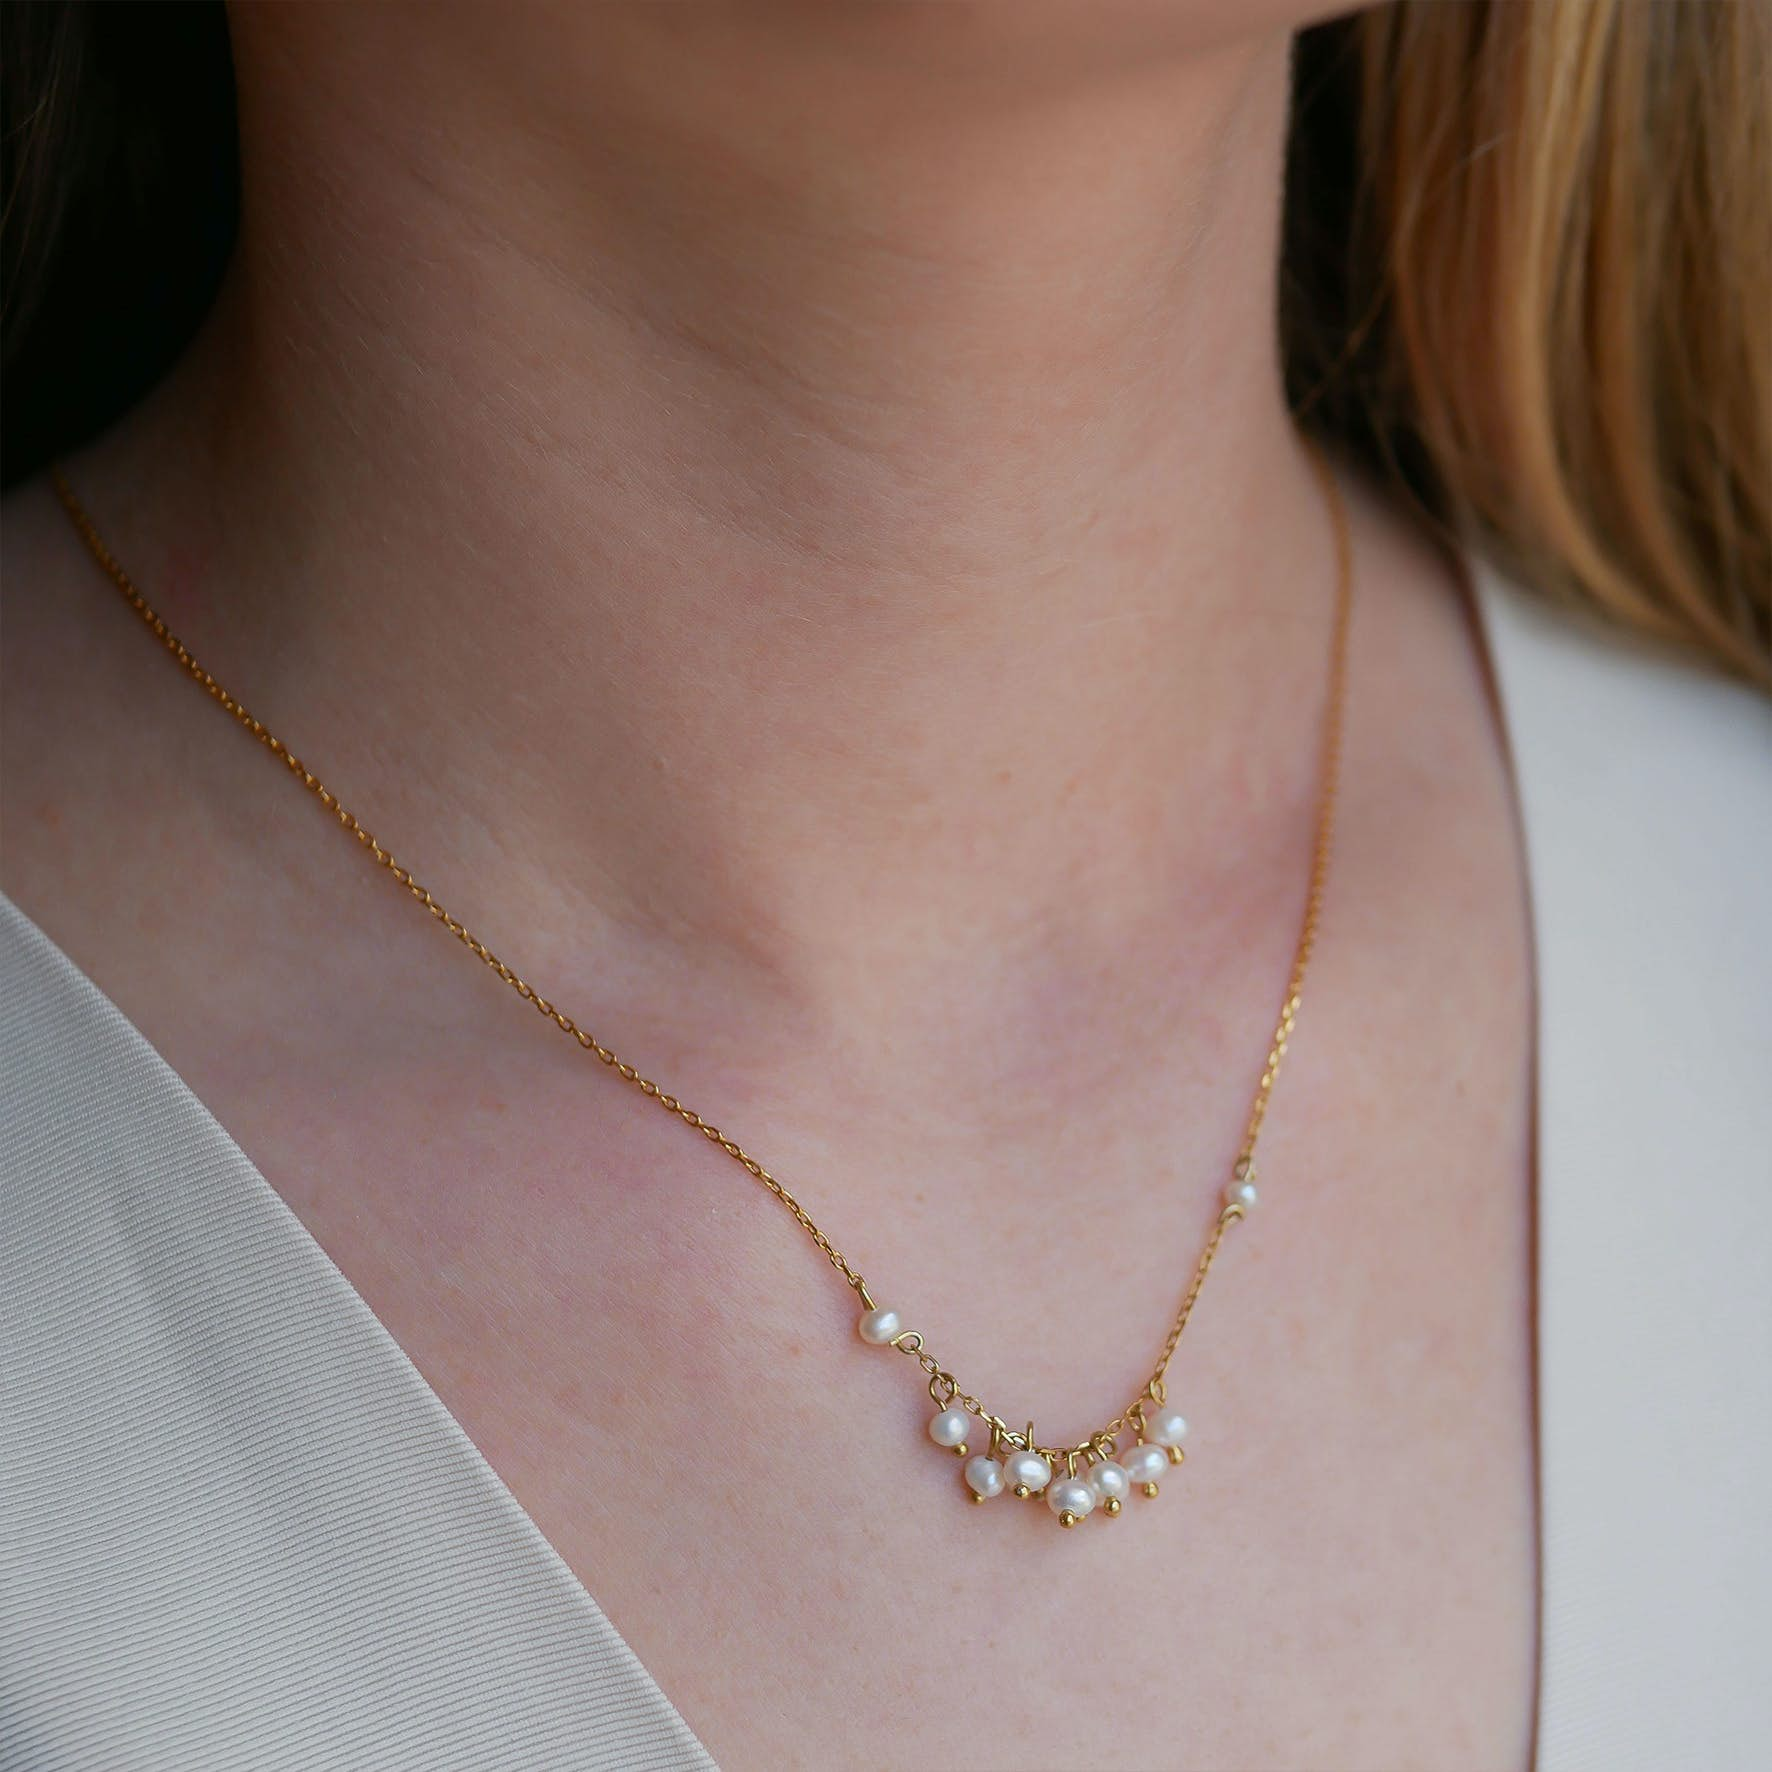 Ophelia Necklace from Enamel Copenhagen in Goldplated-Silver Sterling 925